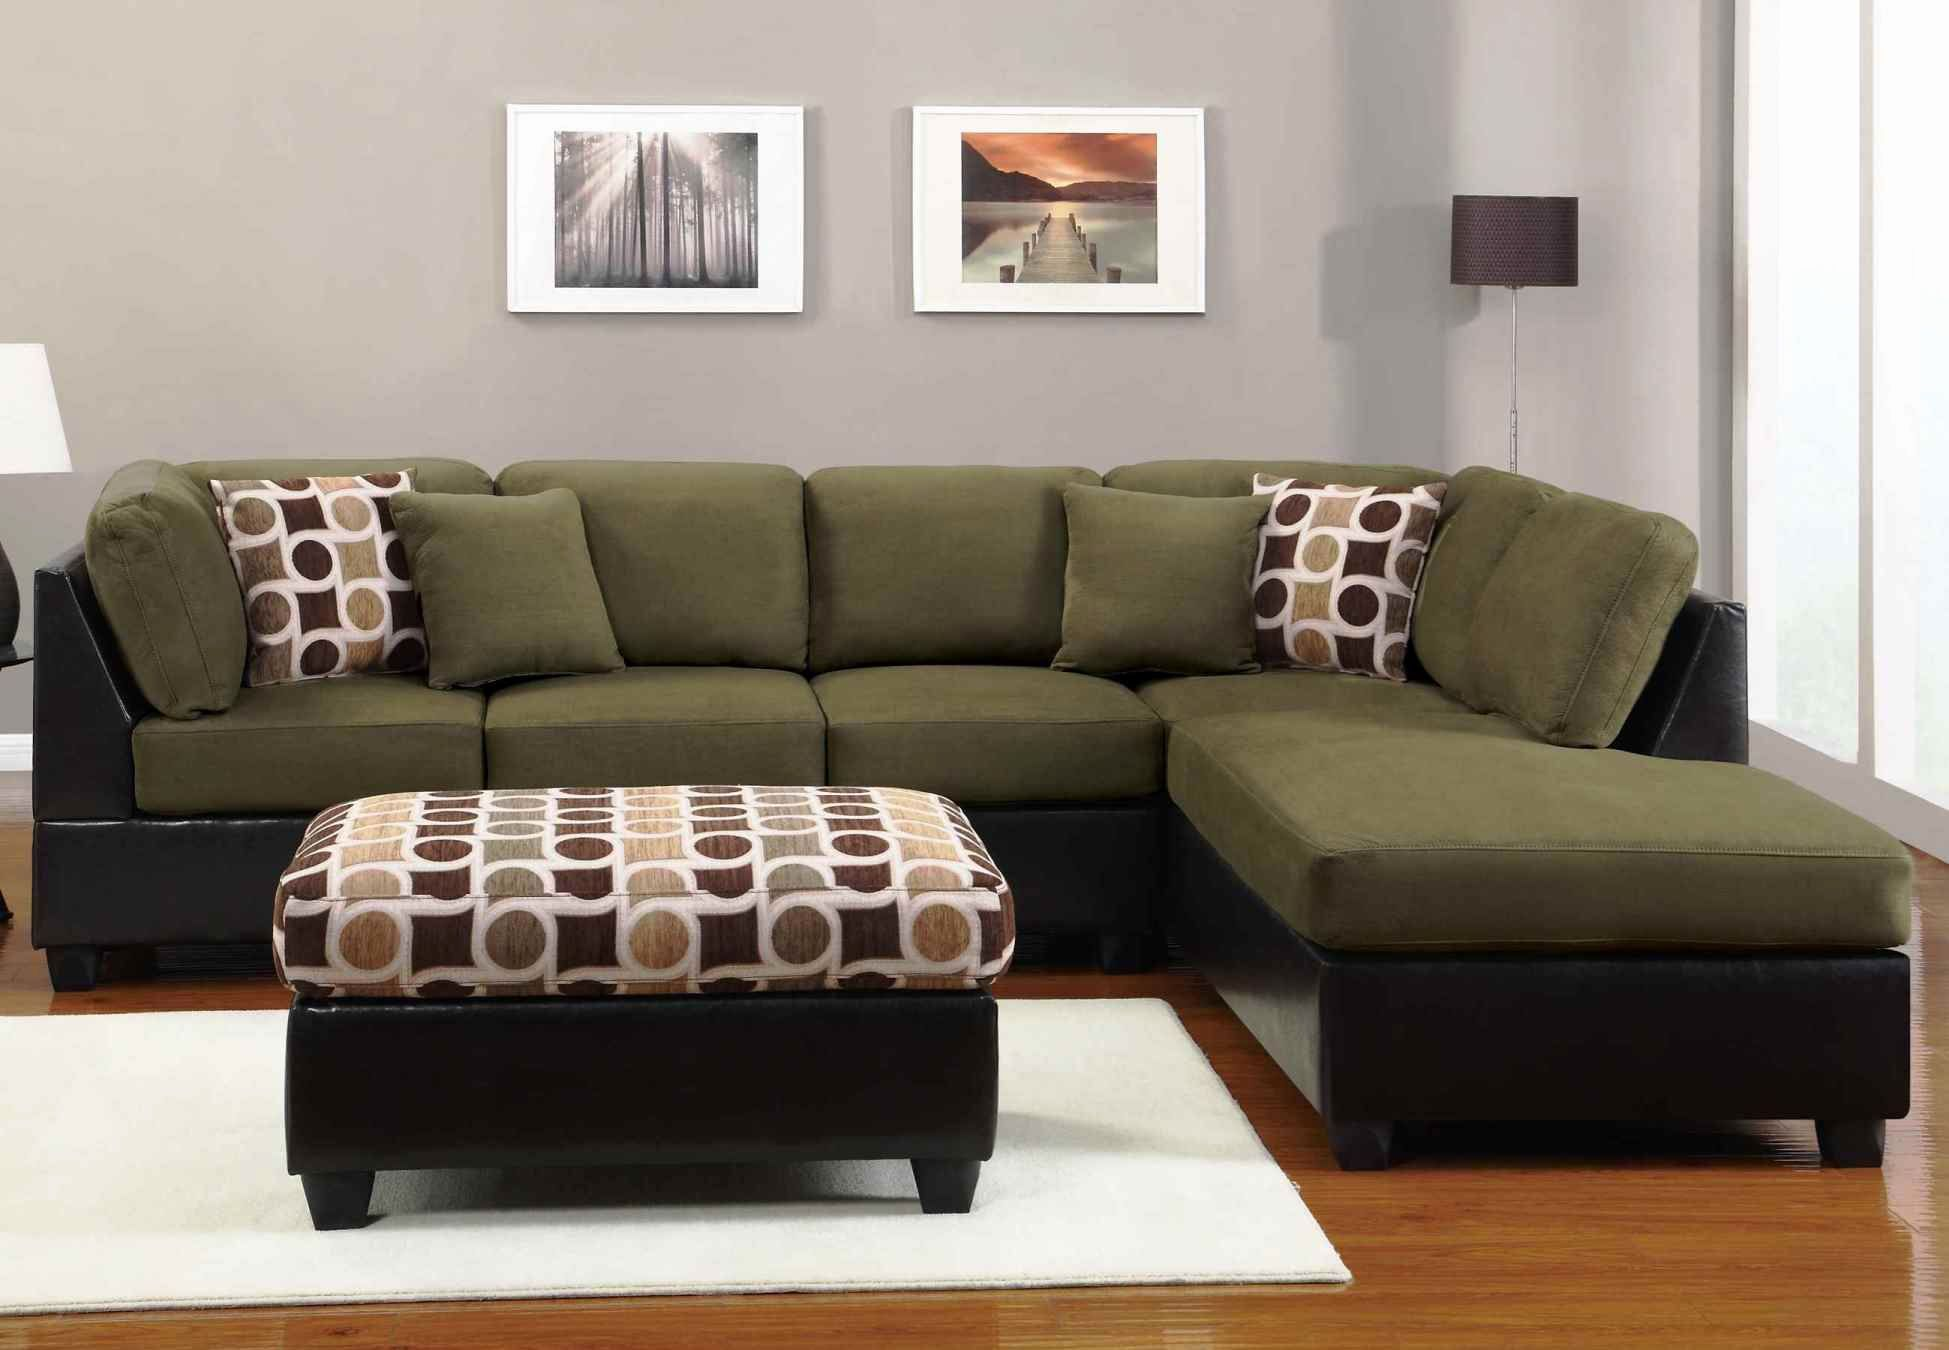 Best Of L Shape Sofa Living Room Pics L Shape Sofa Living Room